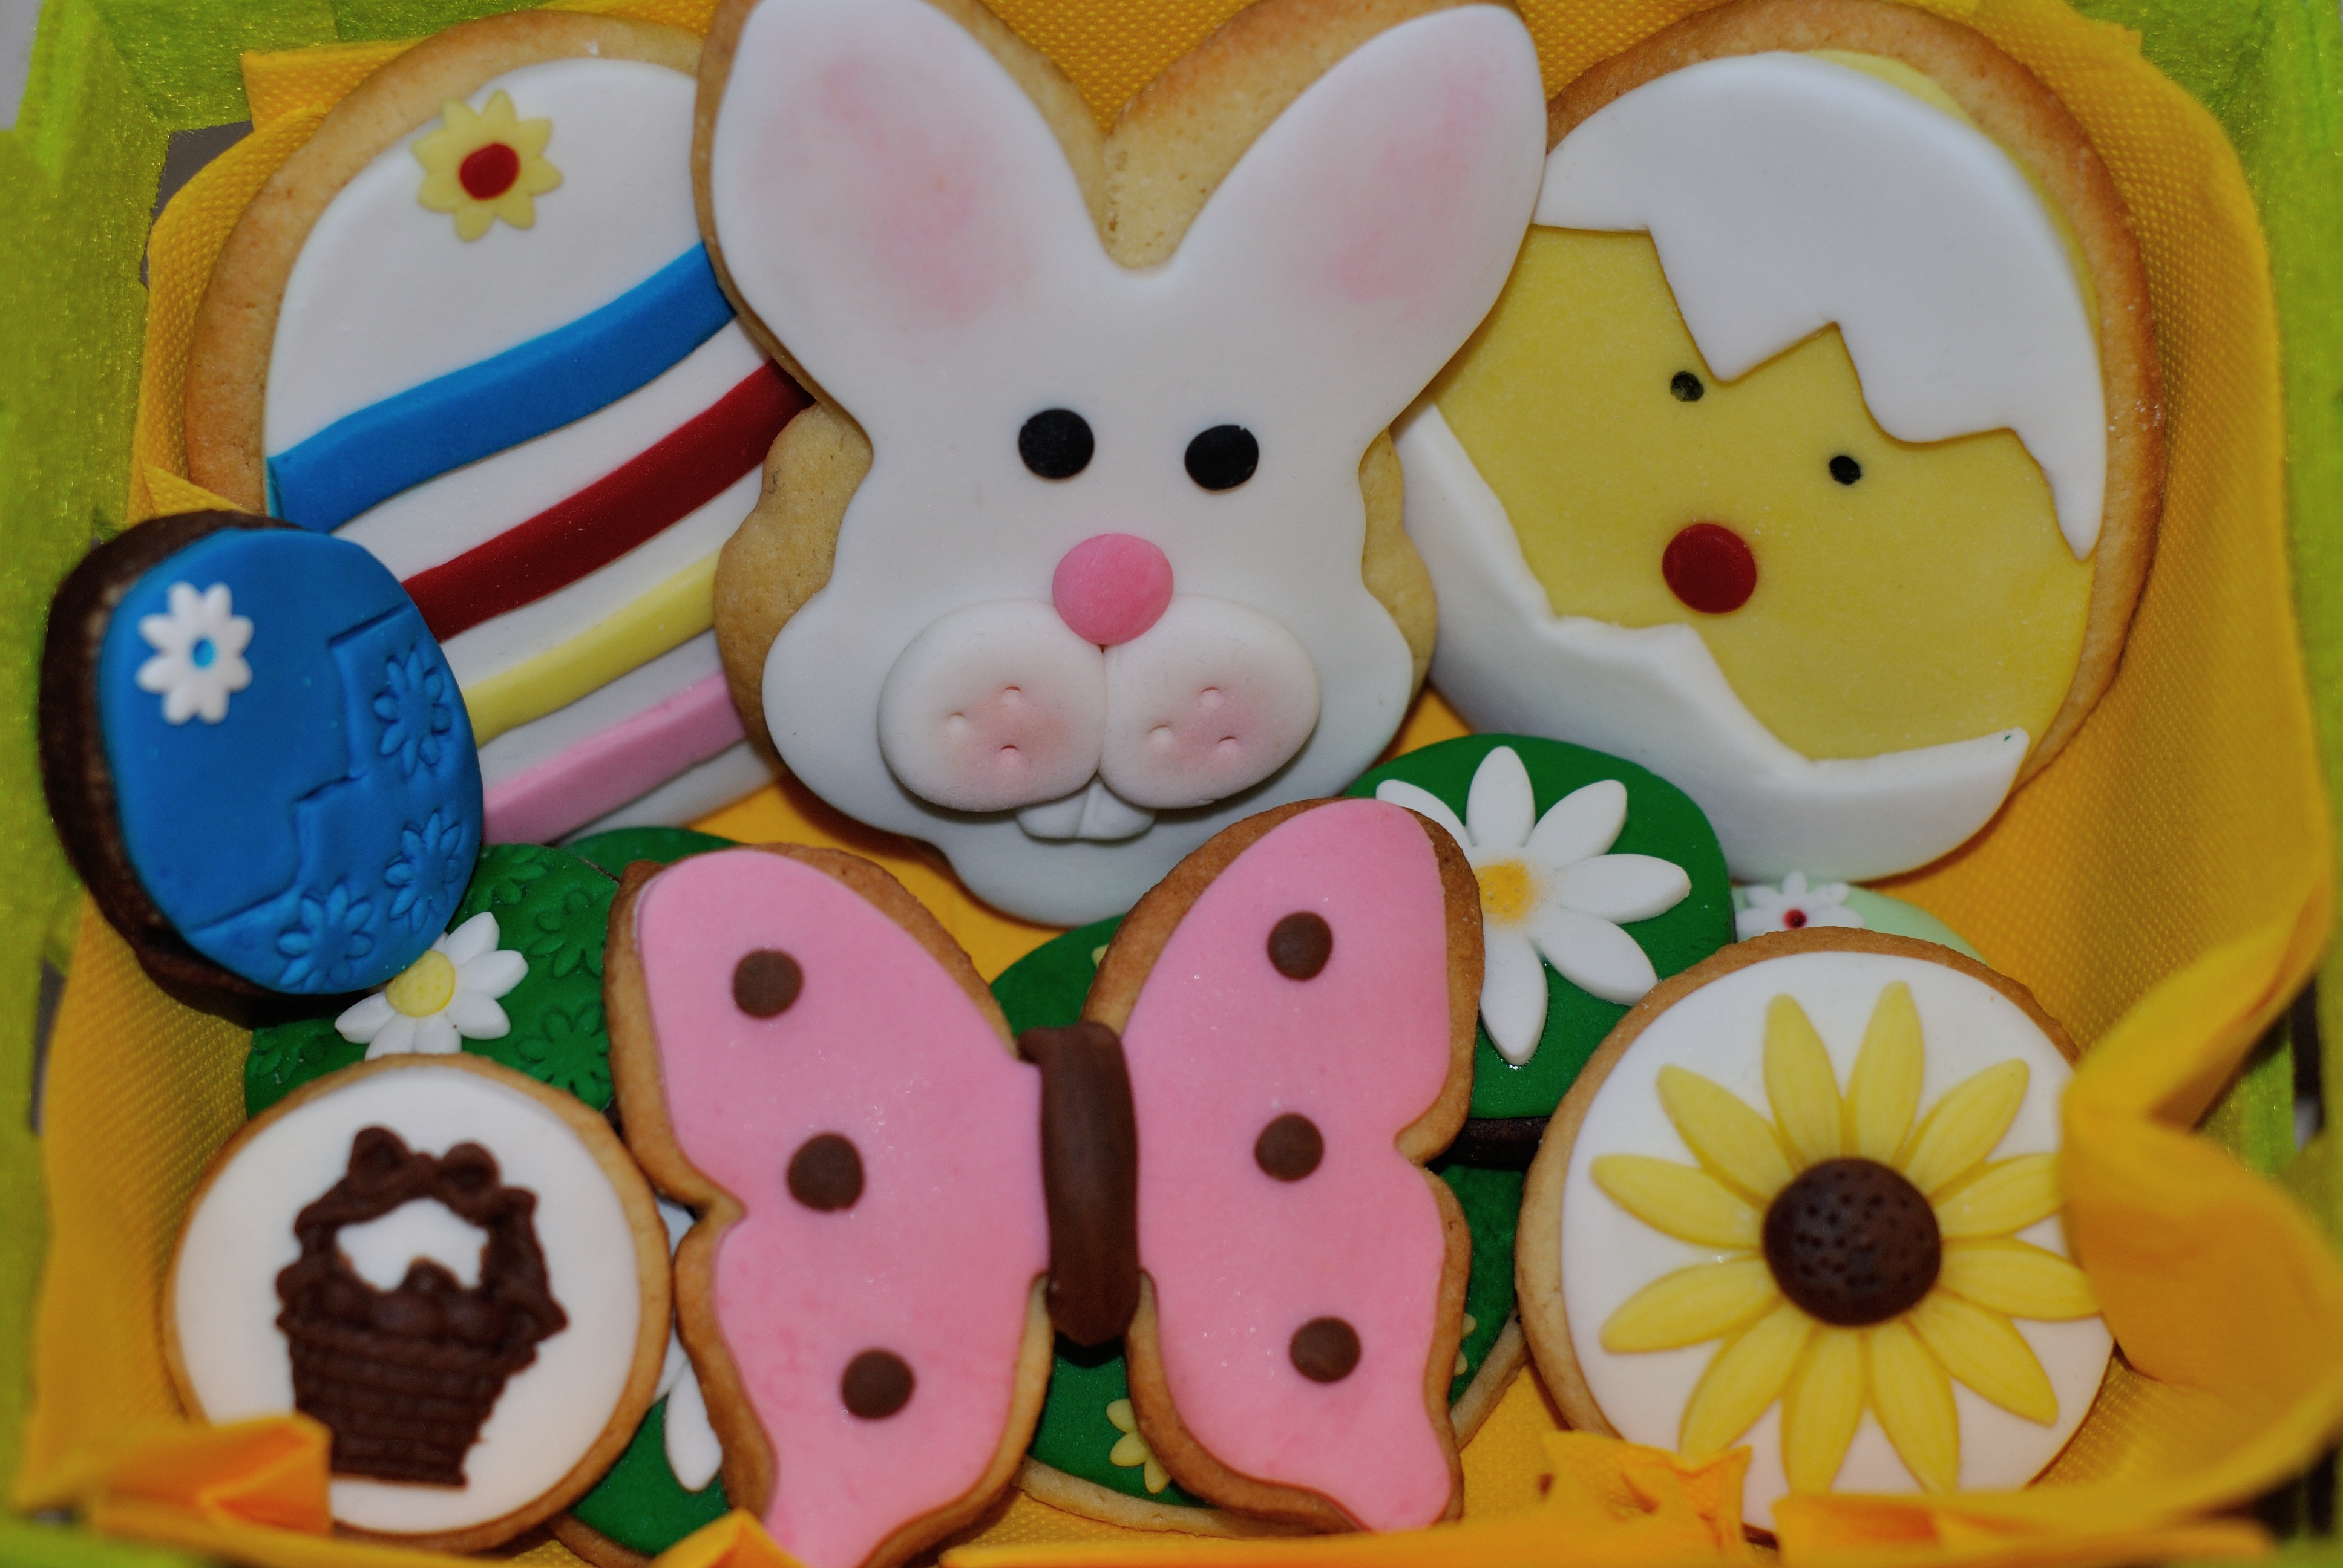 Recettes de biscuits fondants de Pâques